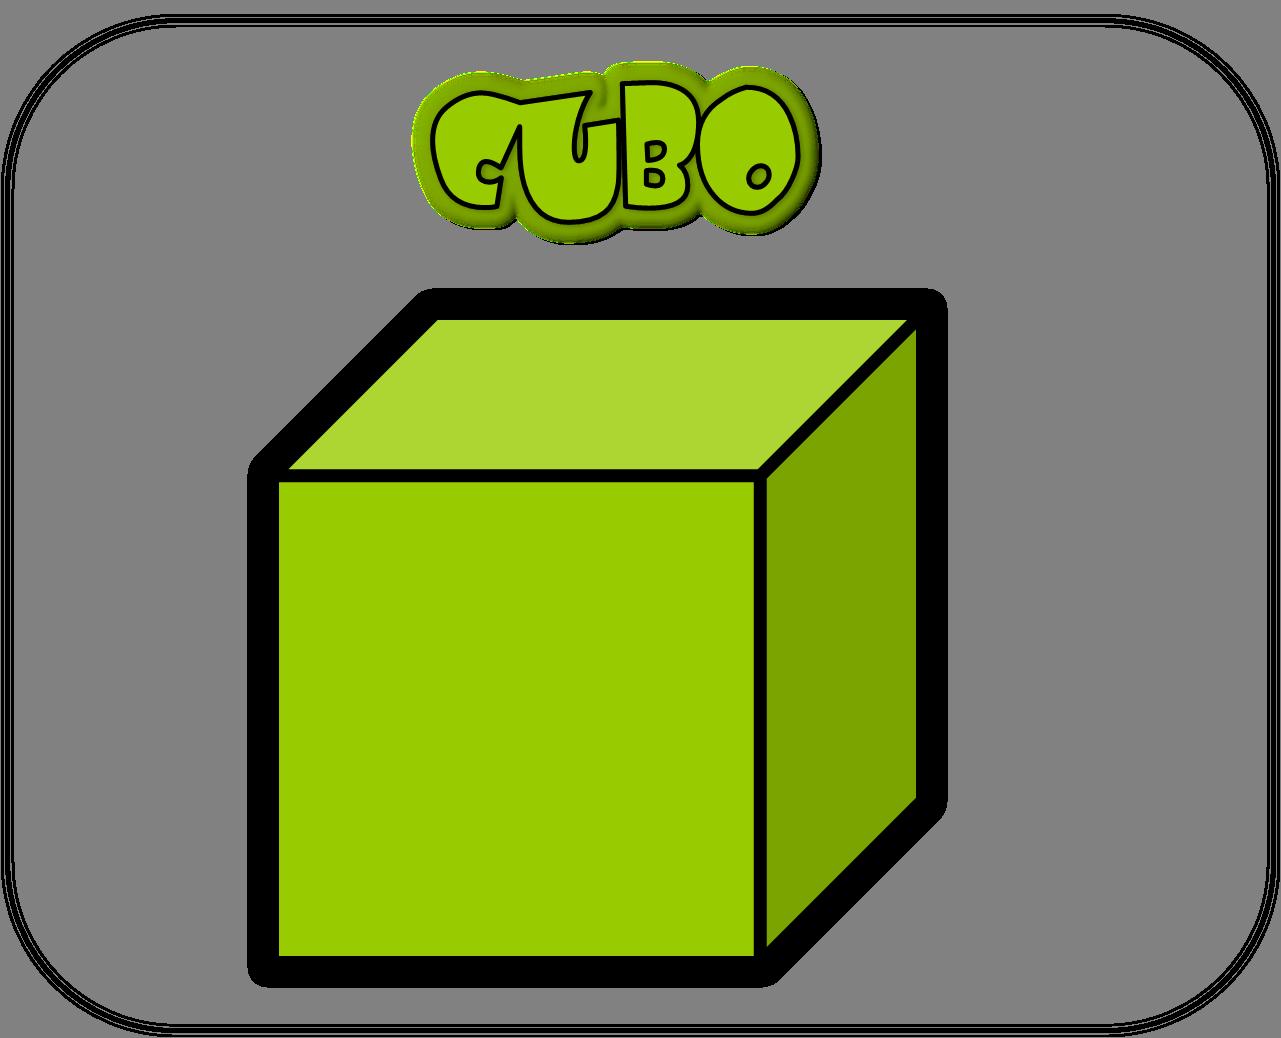 Carteles de las figuras geométricas cubo